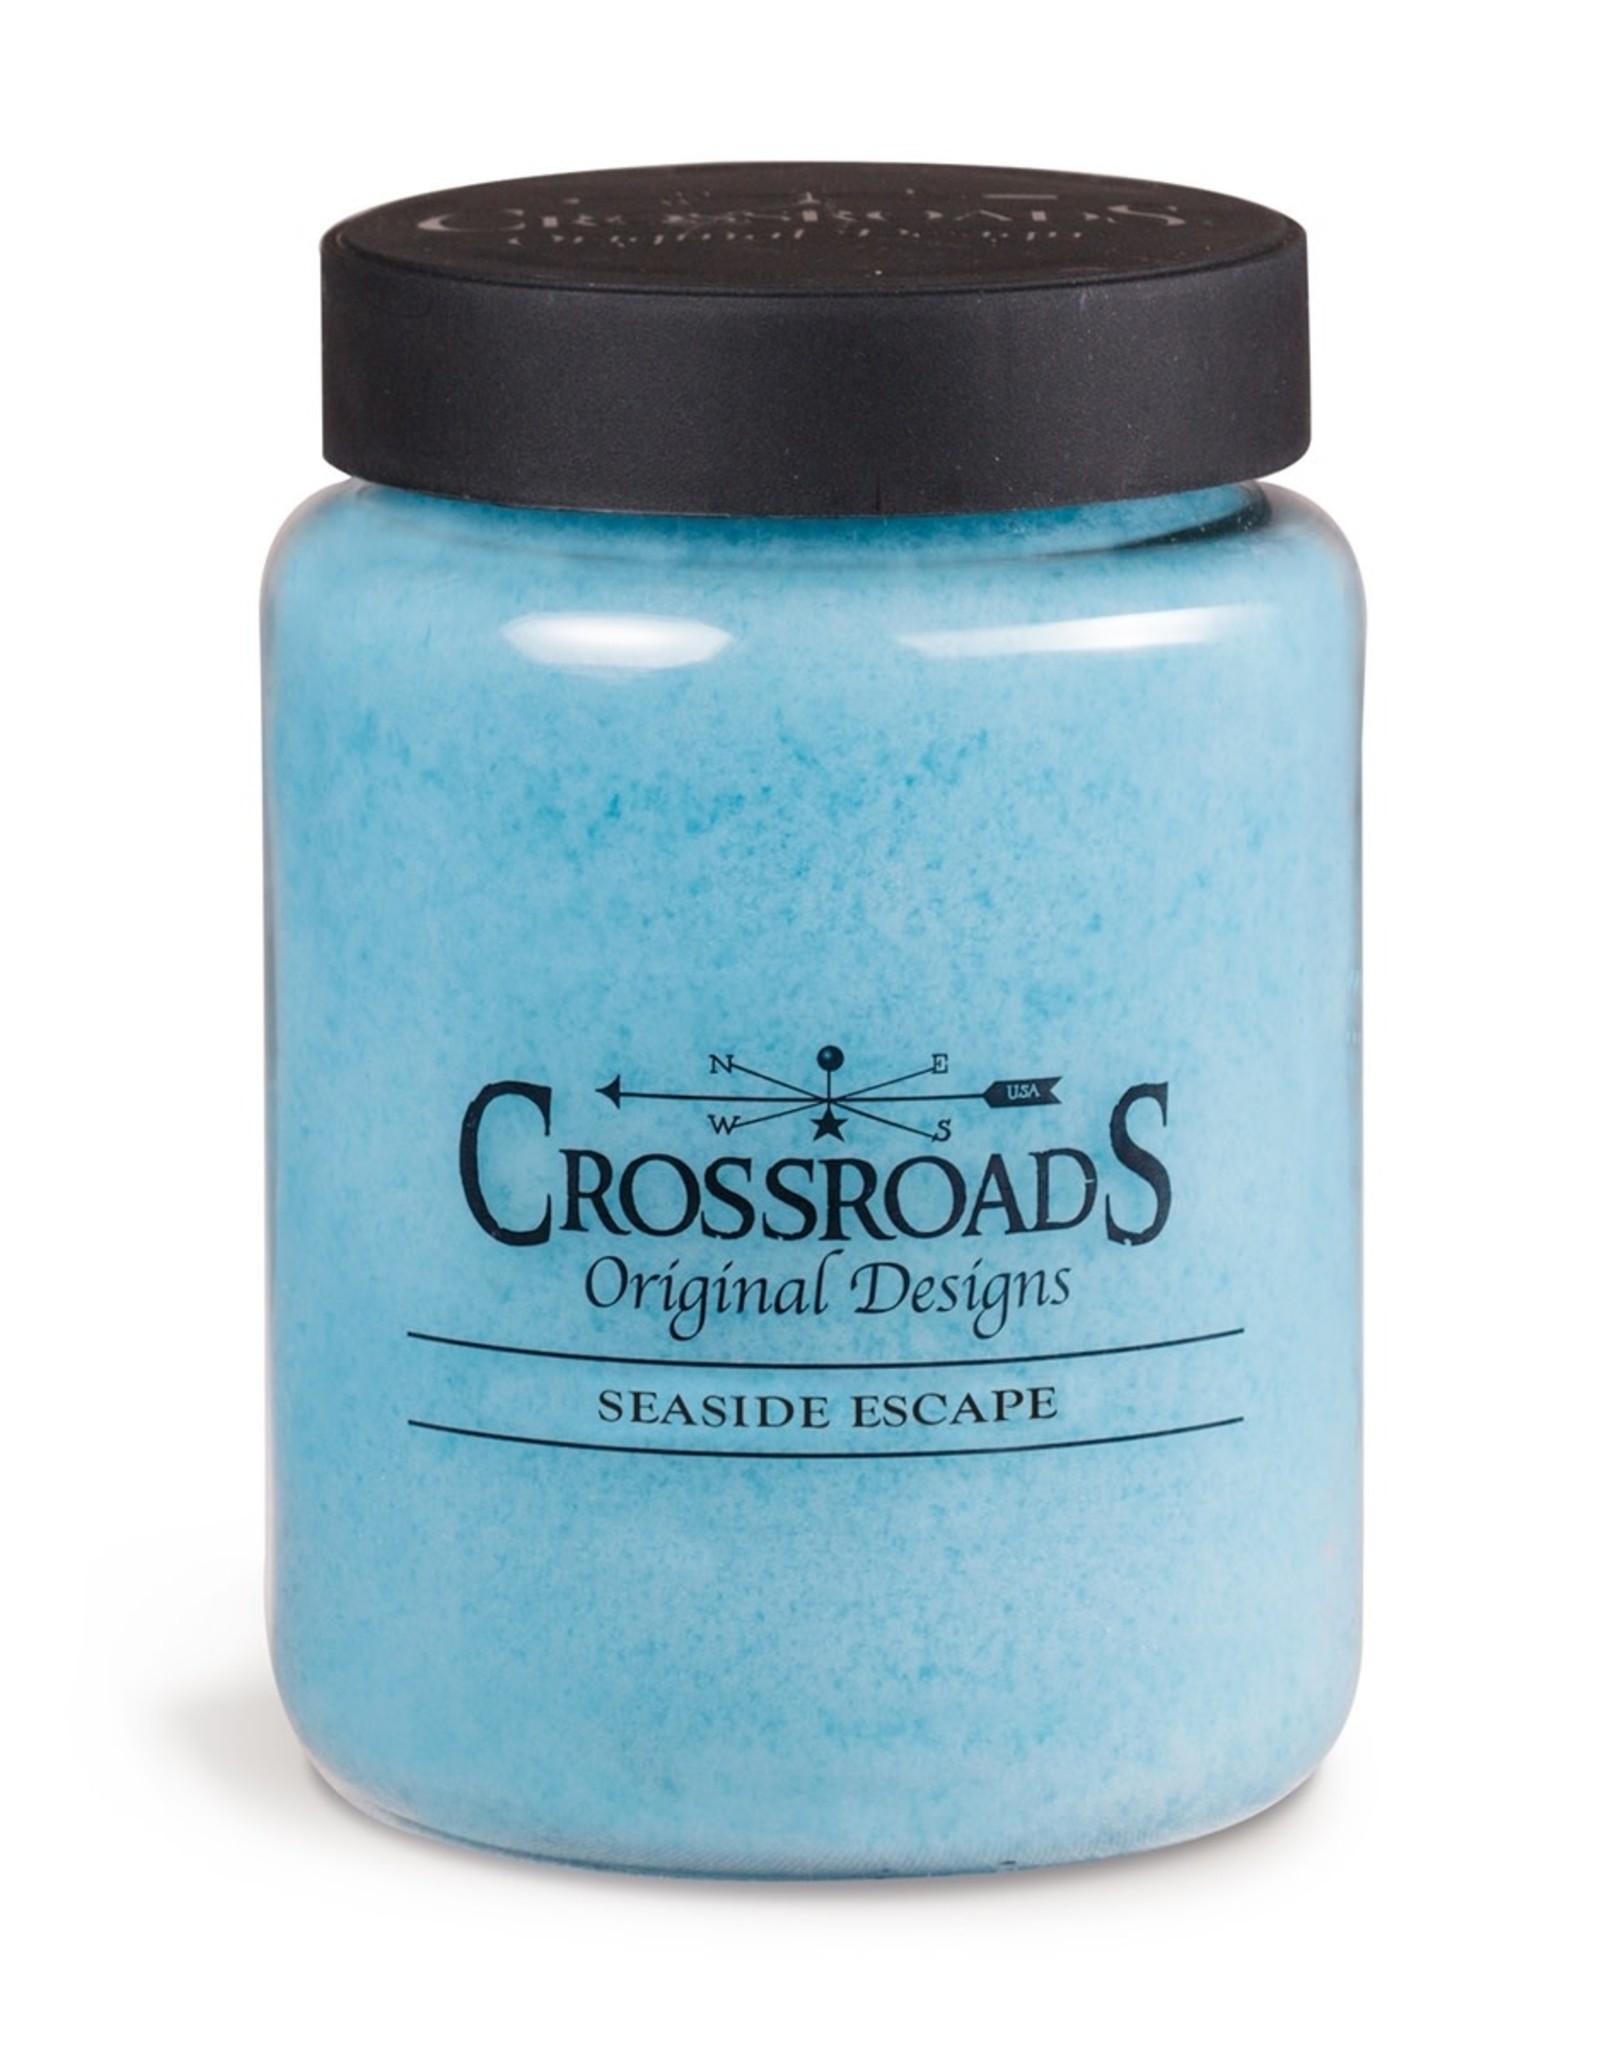 Crossroads Seaside Escape Candle